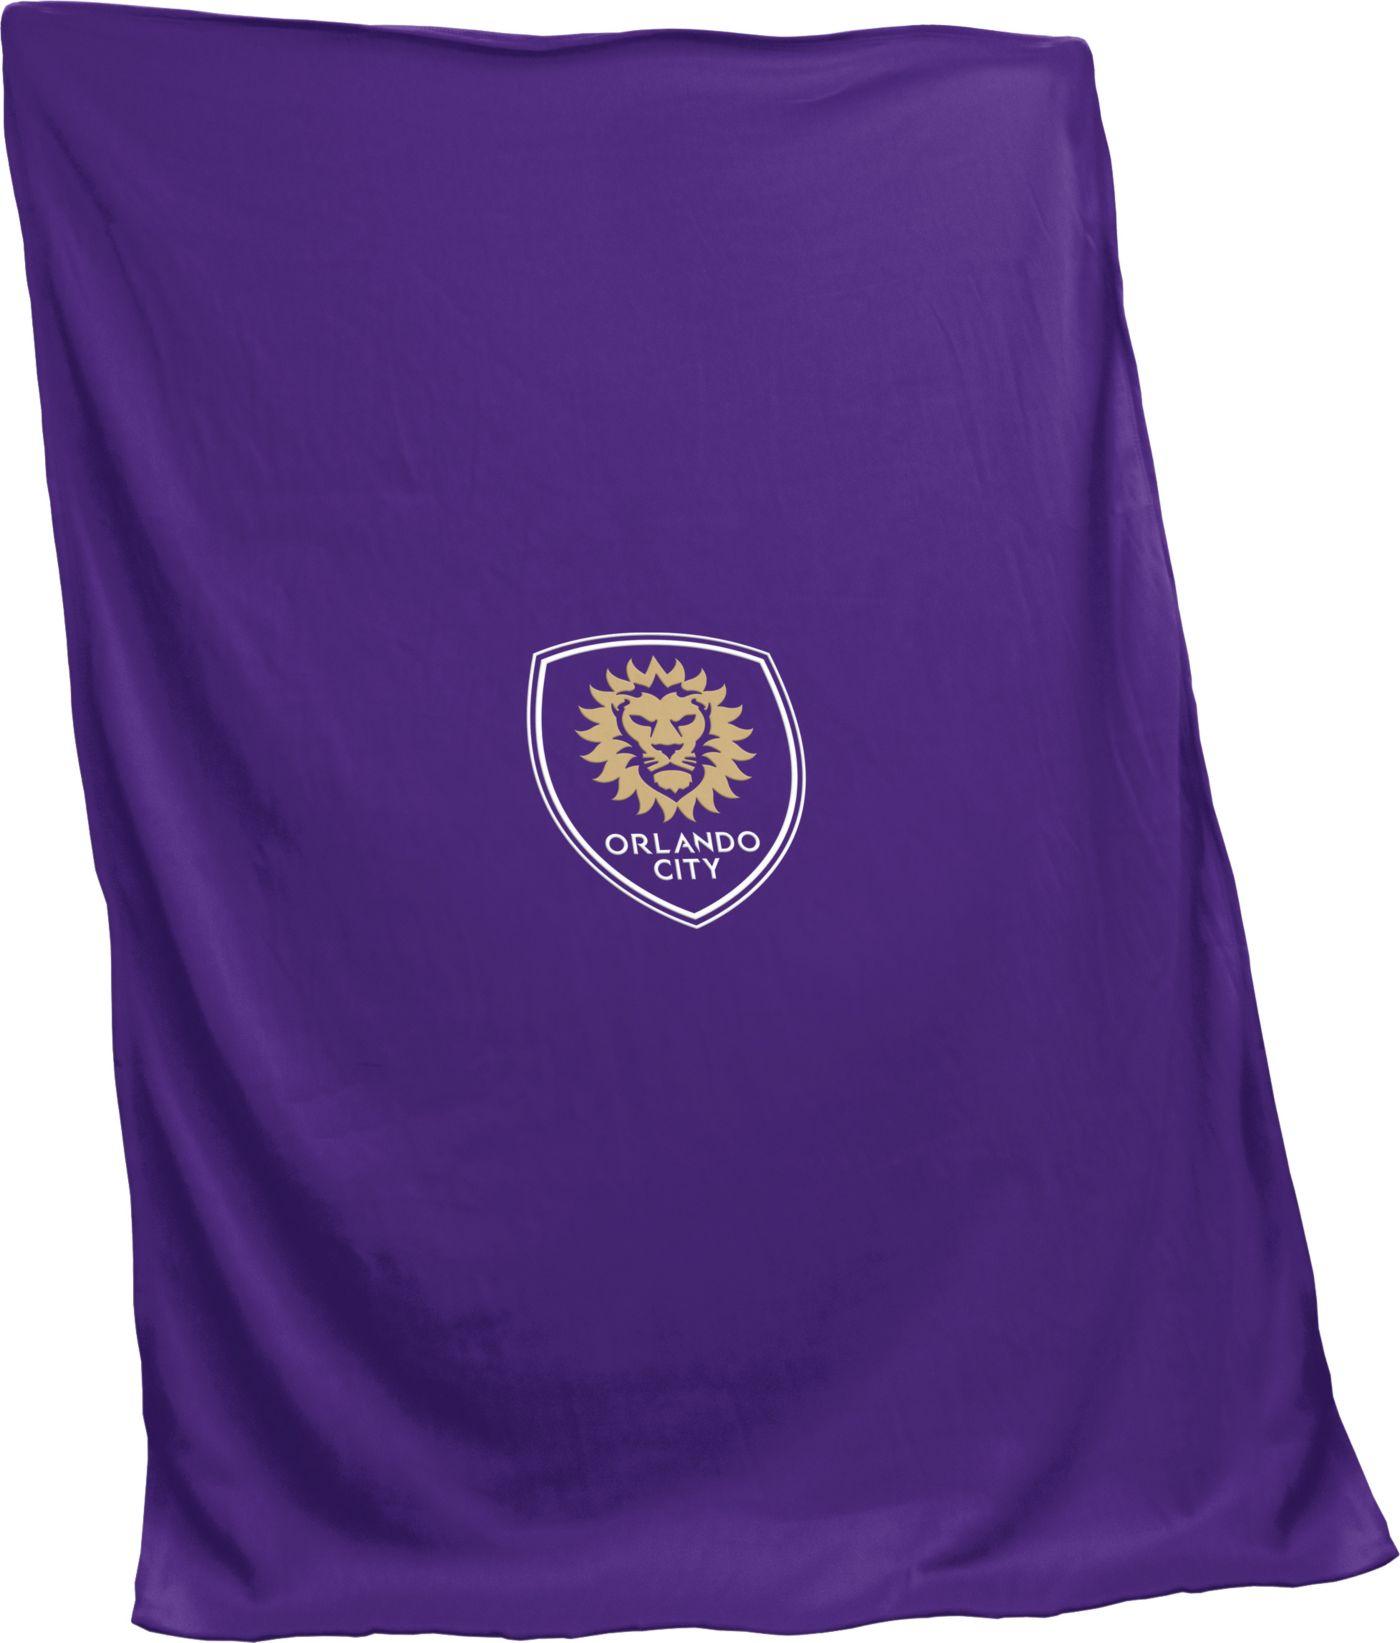 Orlando City Sweatshirt Blanket